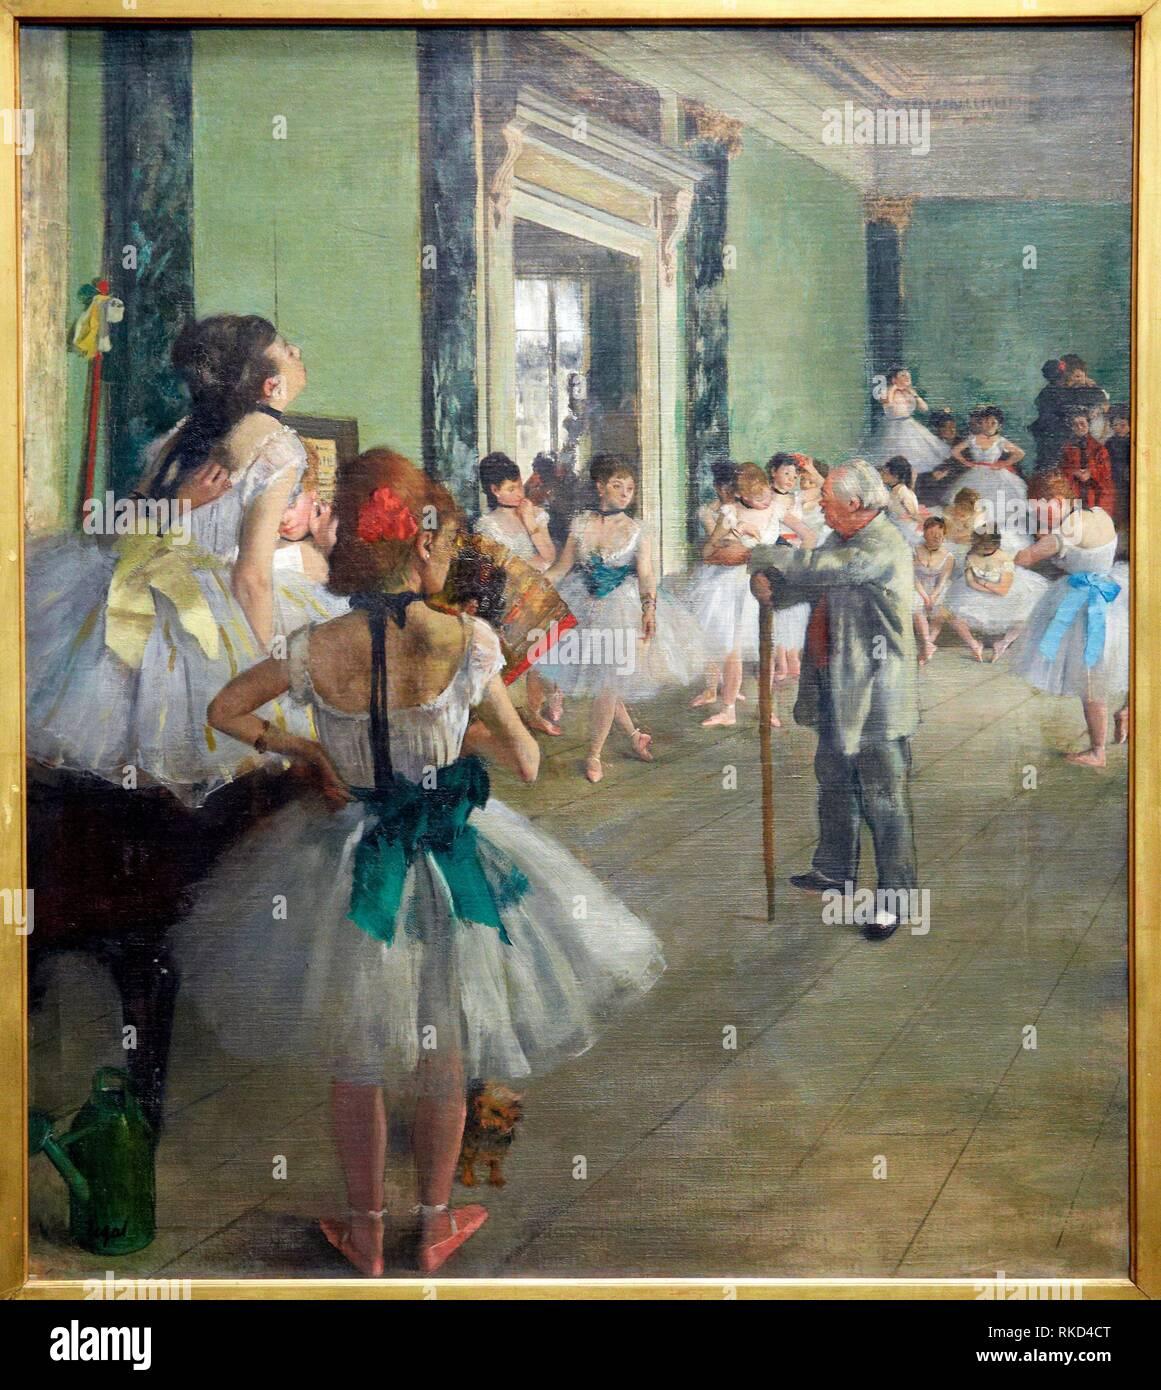 '''The dance class'', 1874, by Edgar Degas (1834-1917), oil on canvas, 85x75 cm. Musée d'Orsay. Orsay Museum. Paris. France. - Stock Image